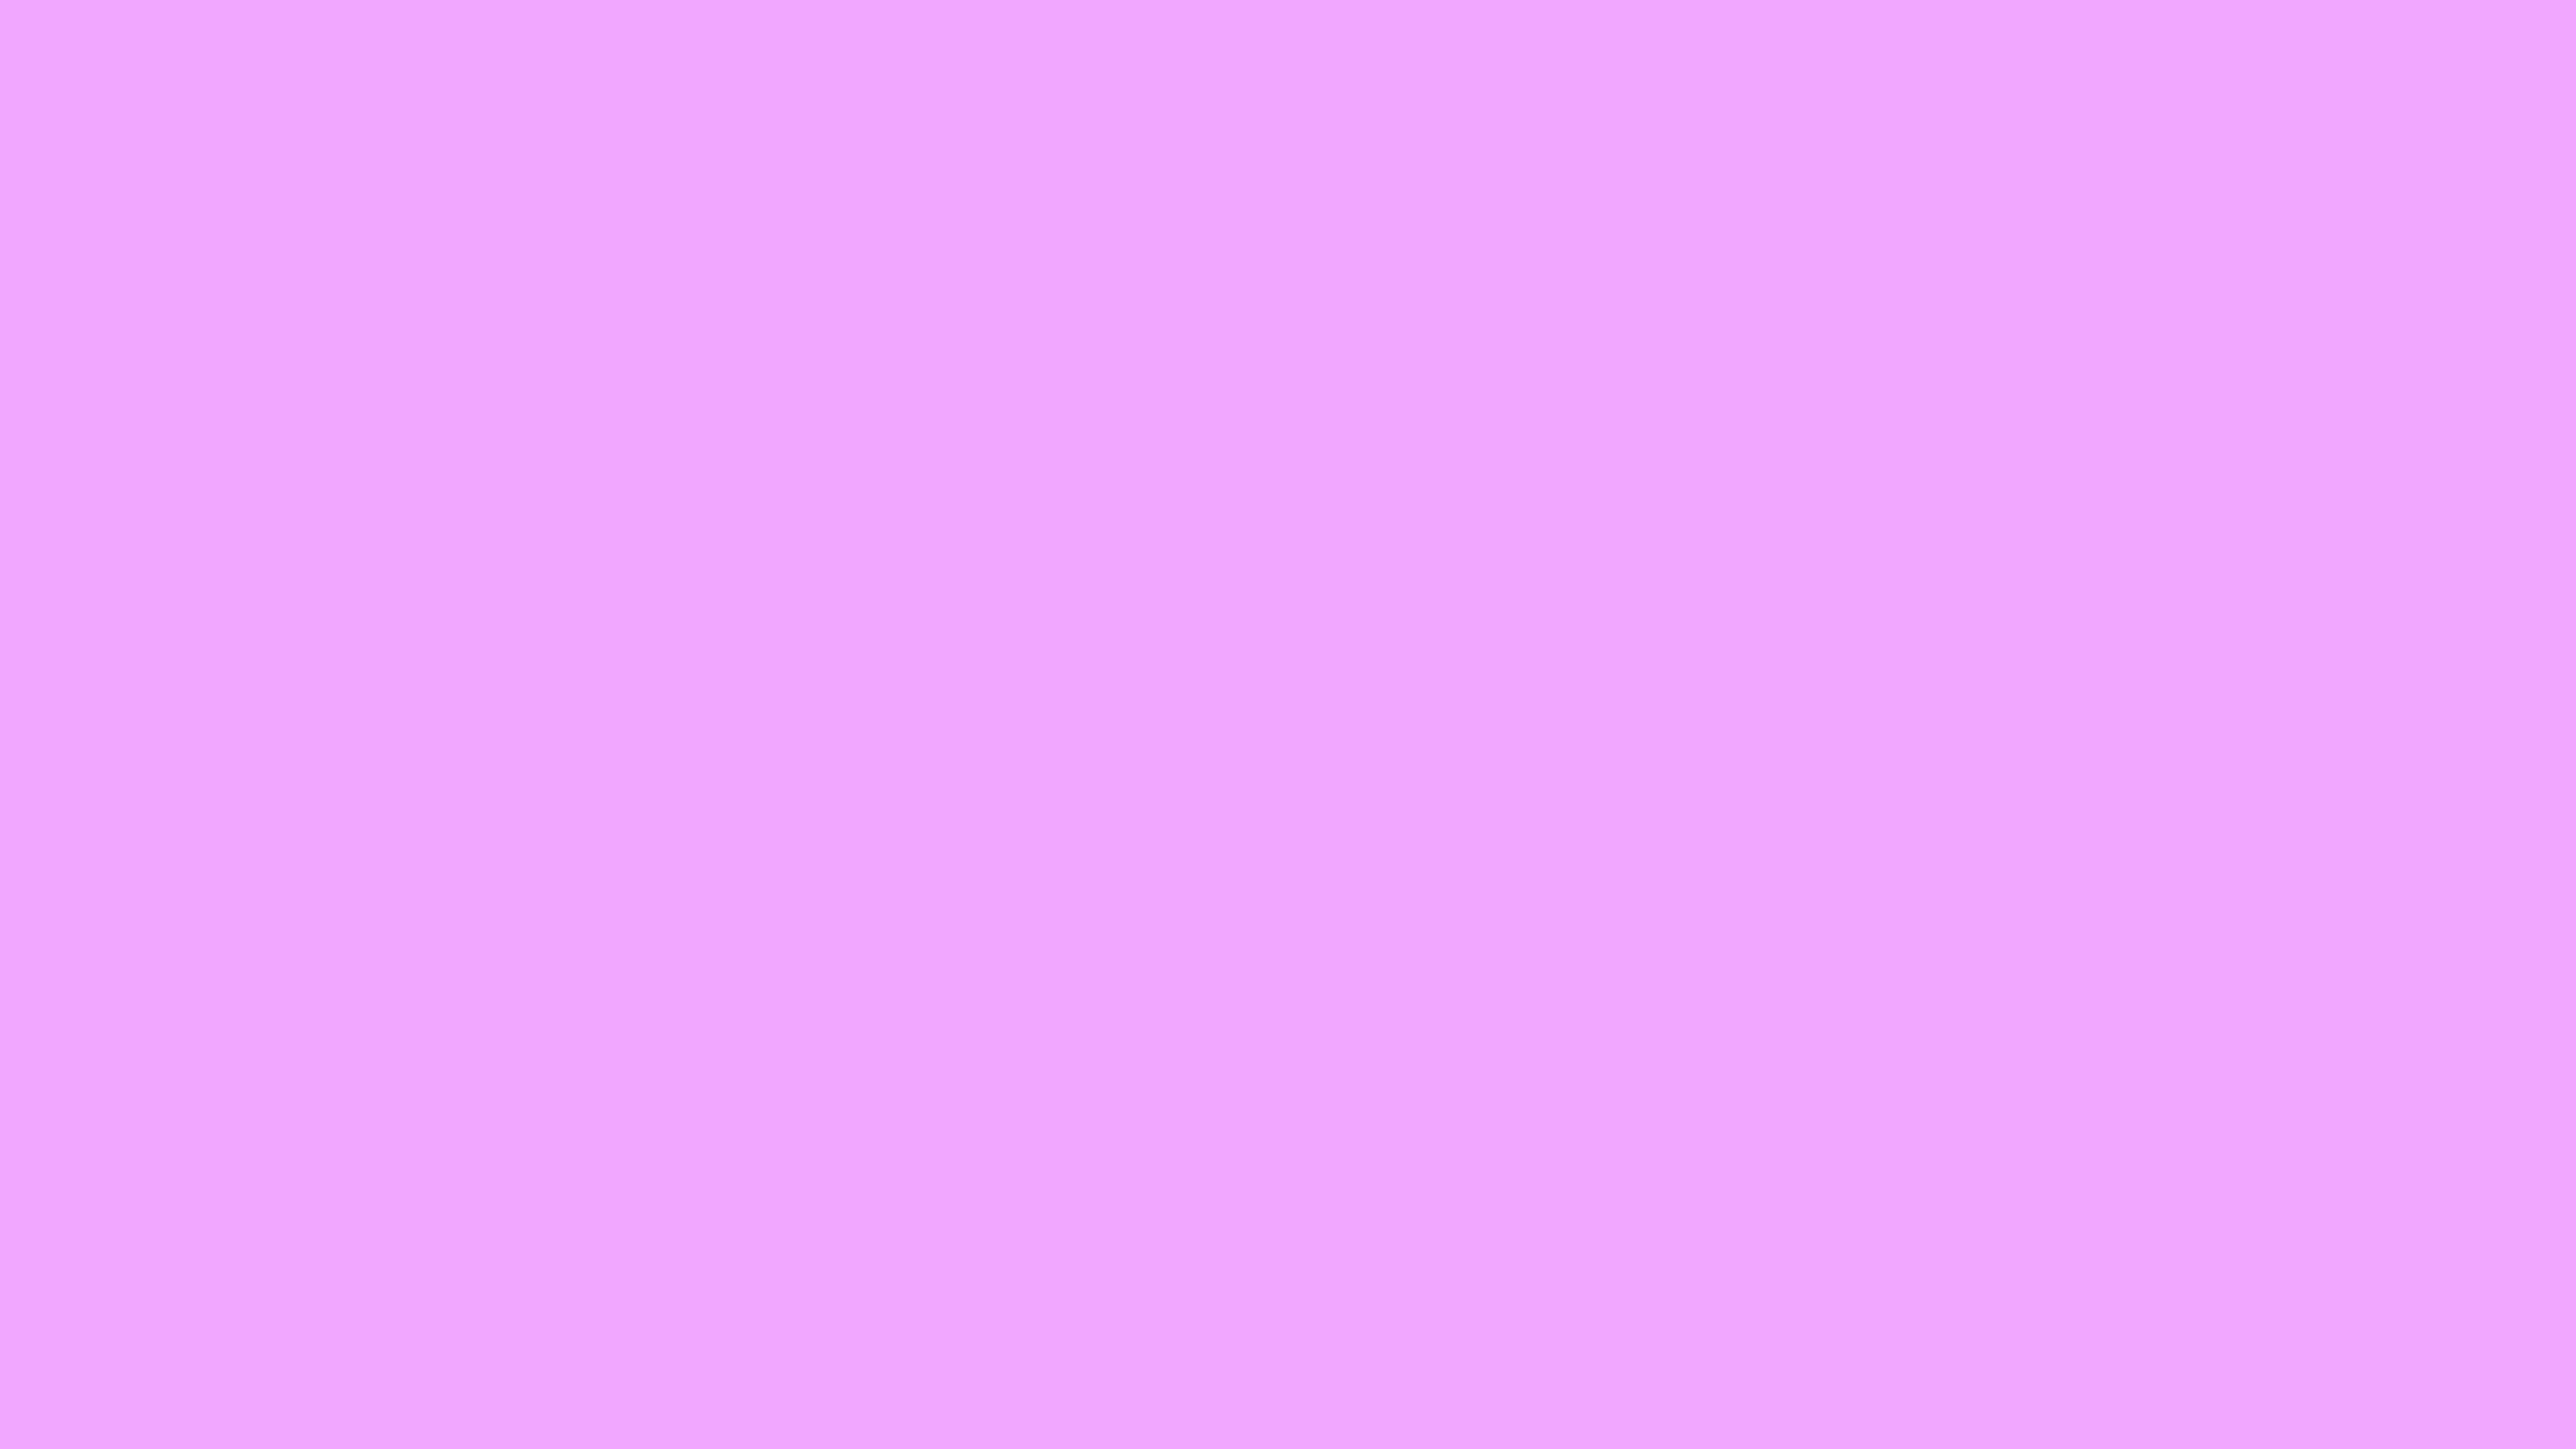 3840x2160 Rich Brilliant Lavender Solid Color Background